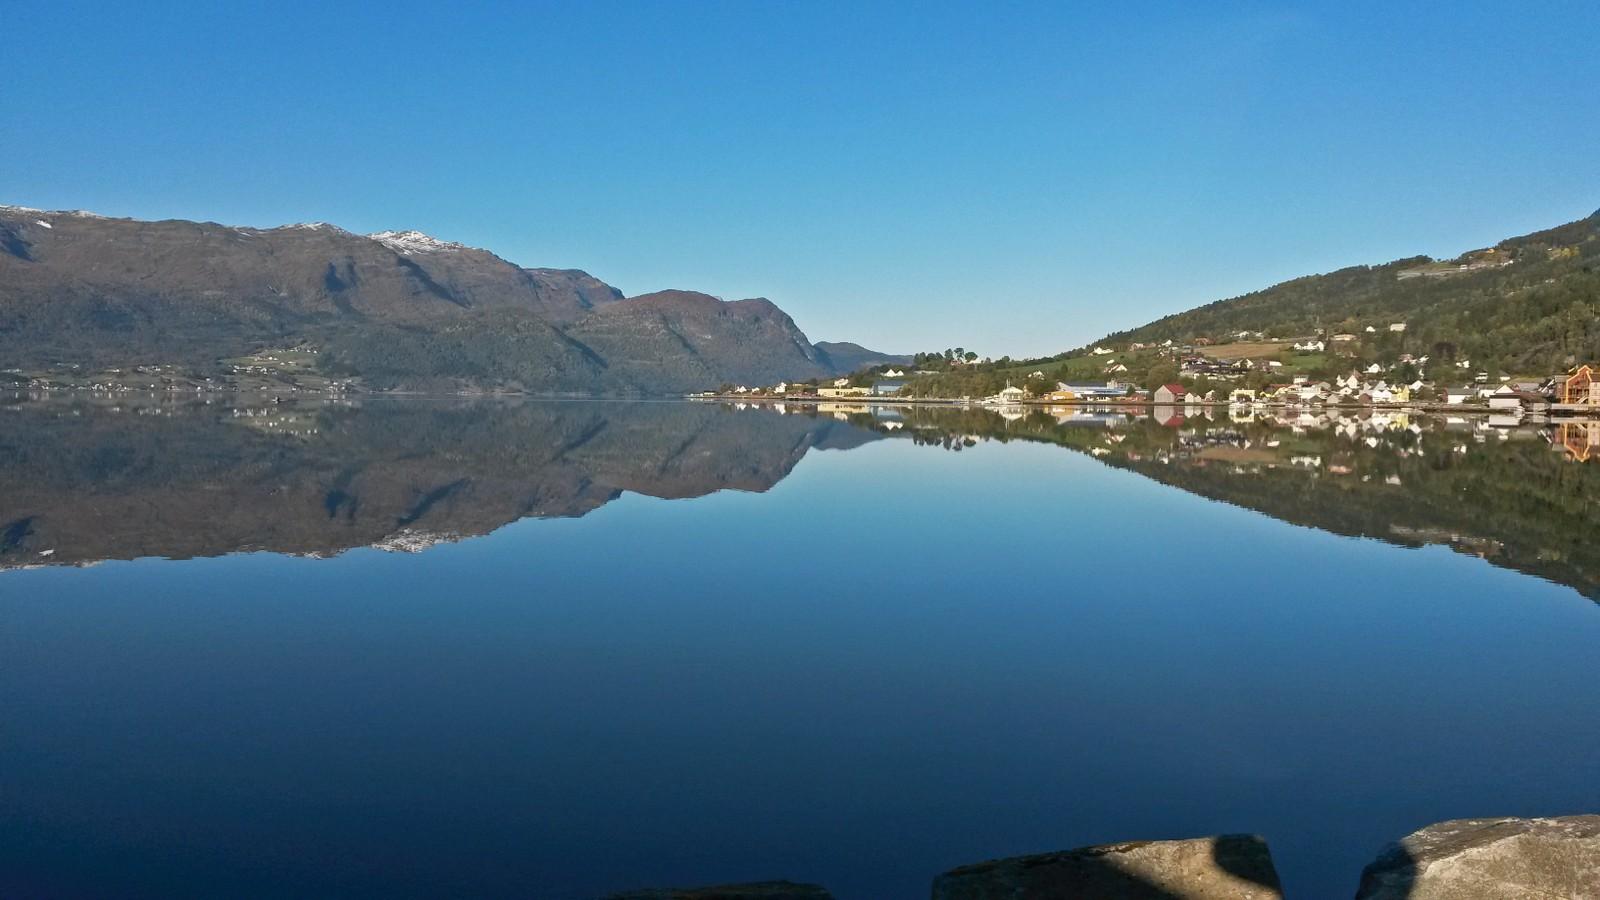 Gloppefjorden, Sandane.